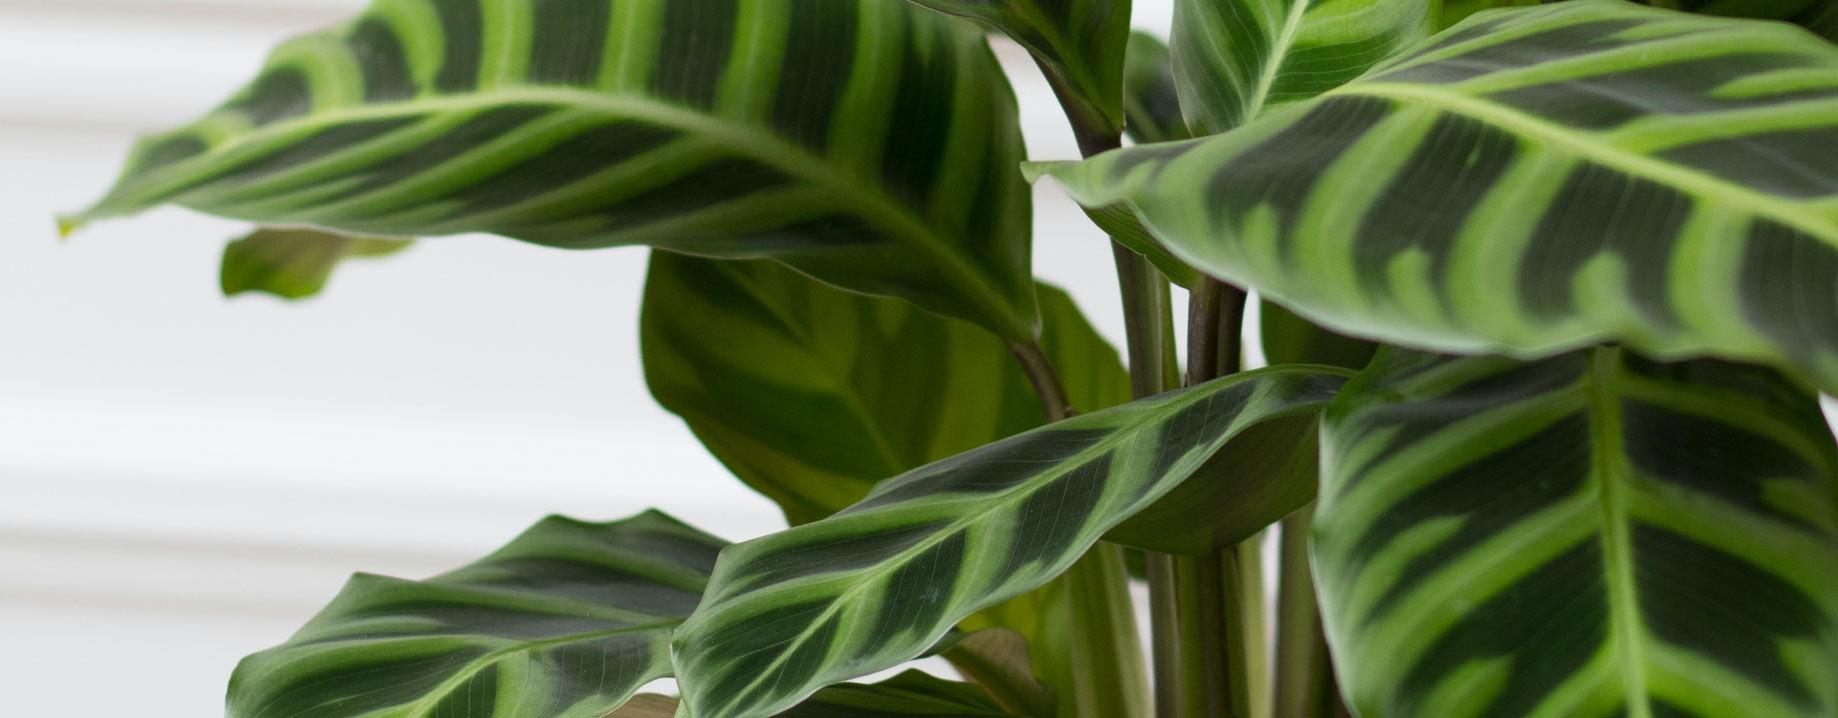 Plant detail 3